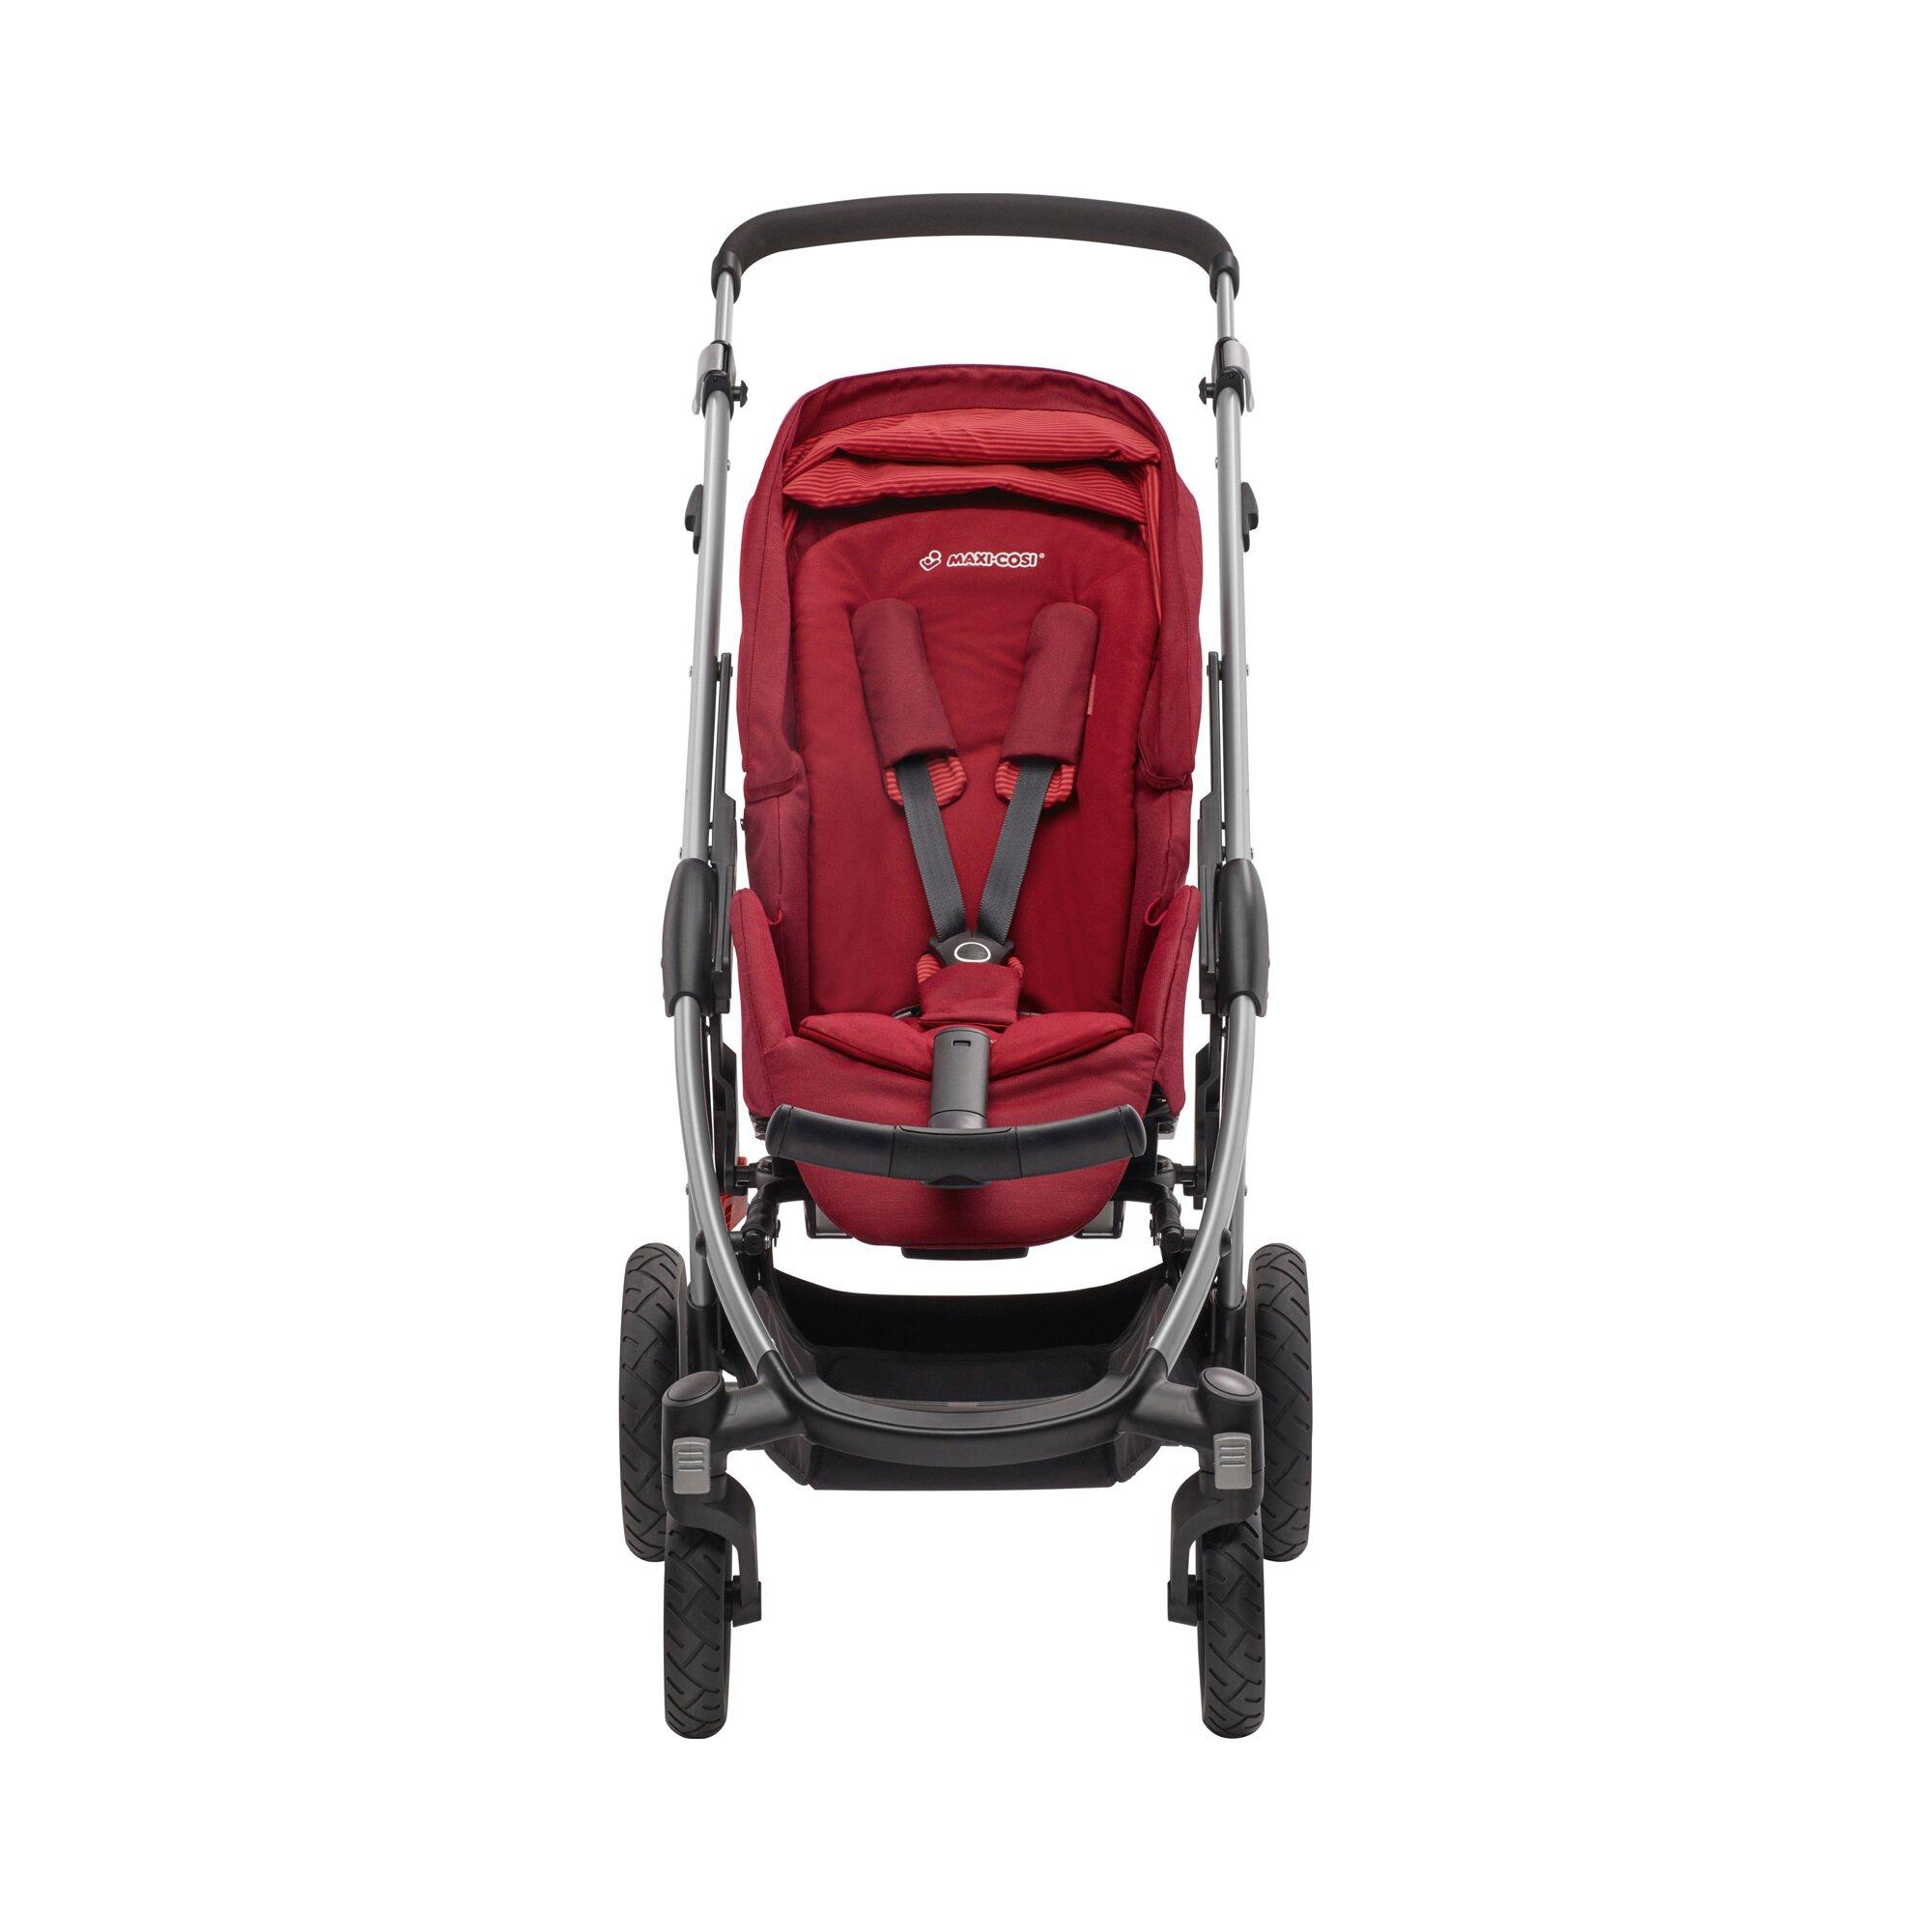 maxi-cosi-stella-kinderwagen-design-2016-schwarz